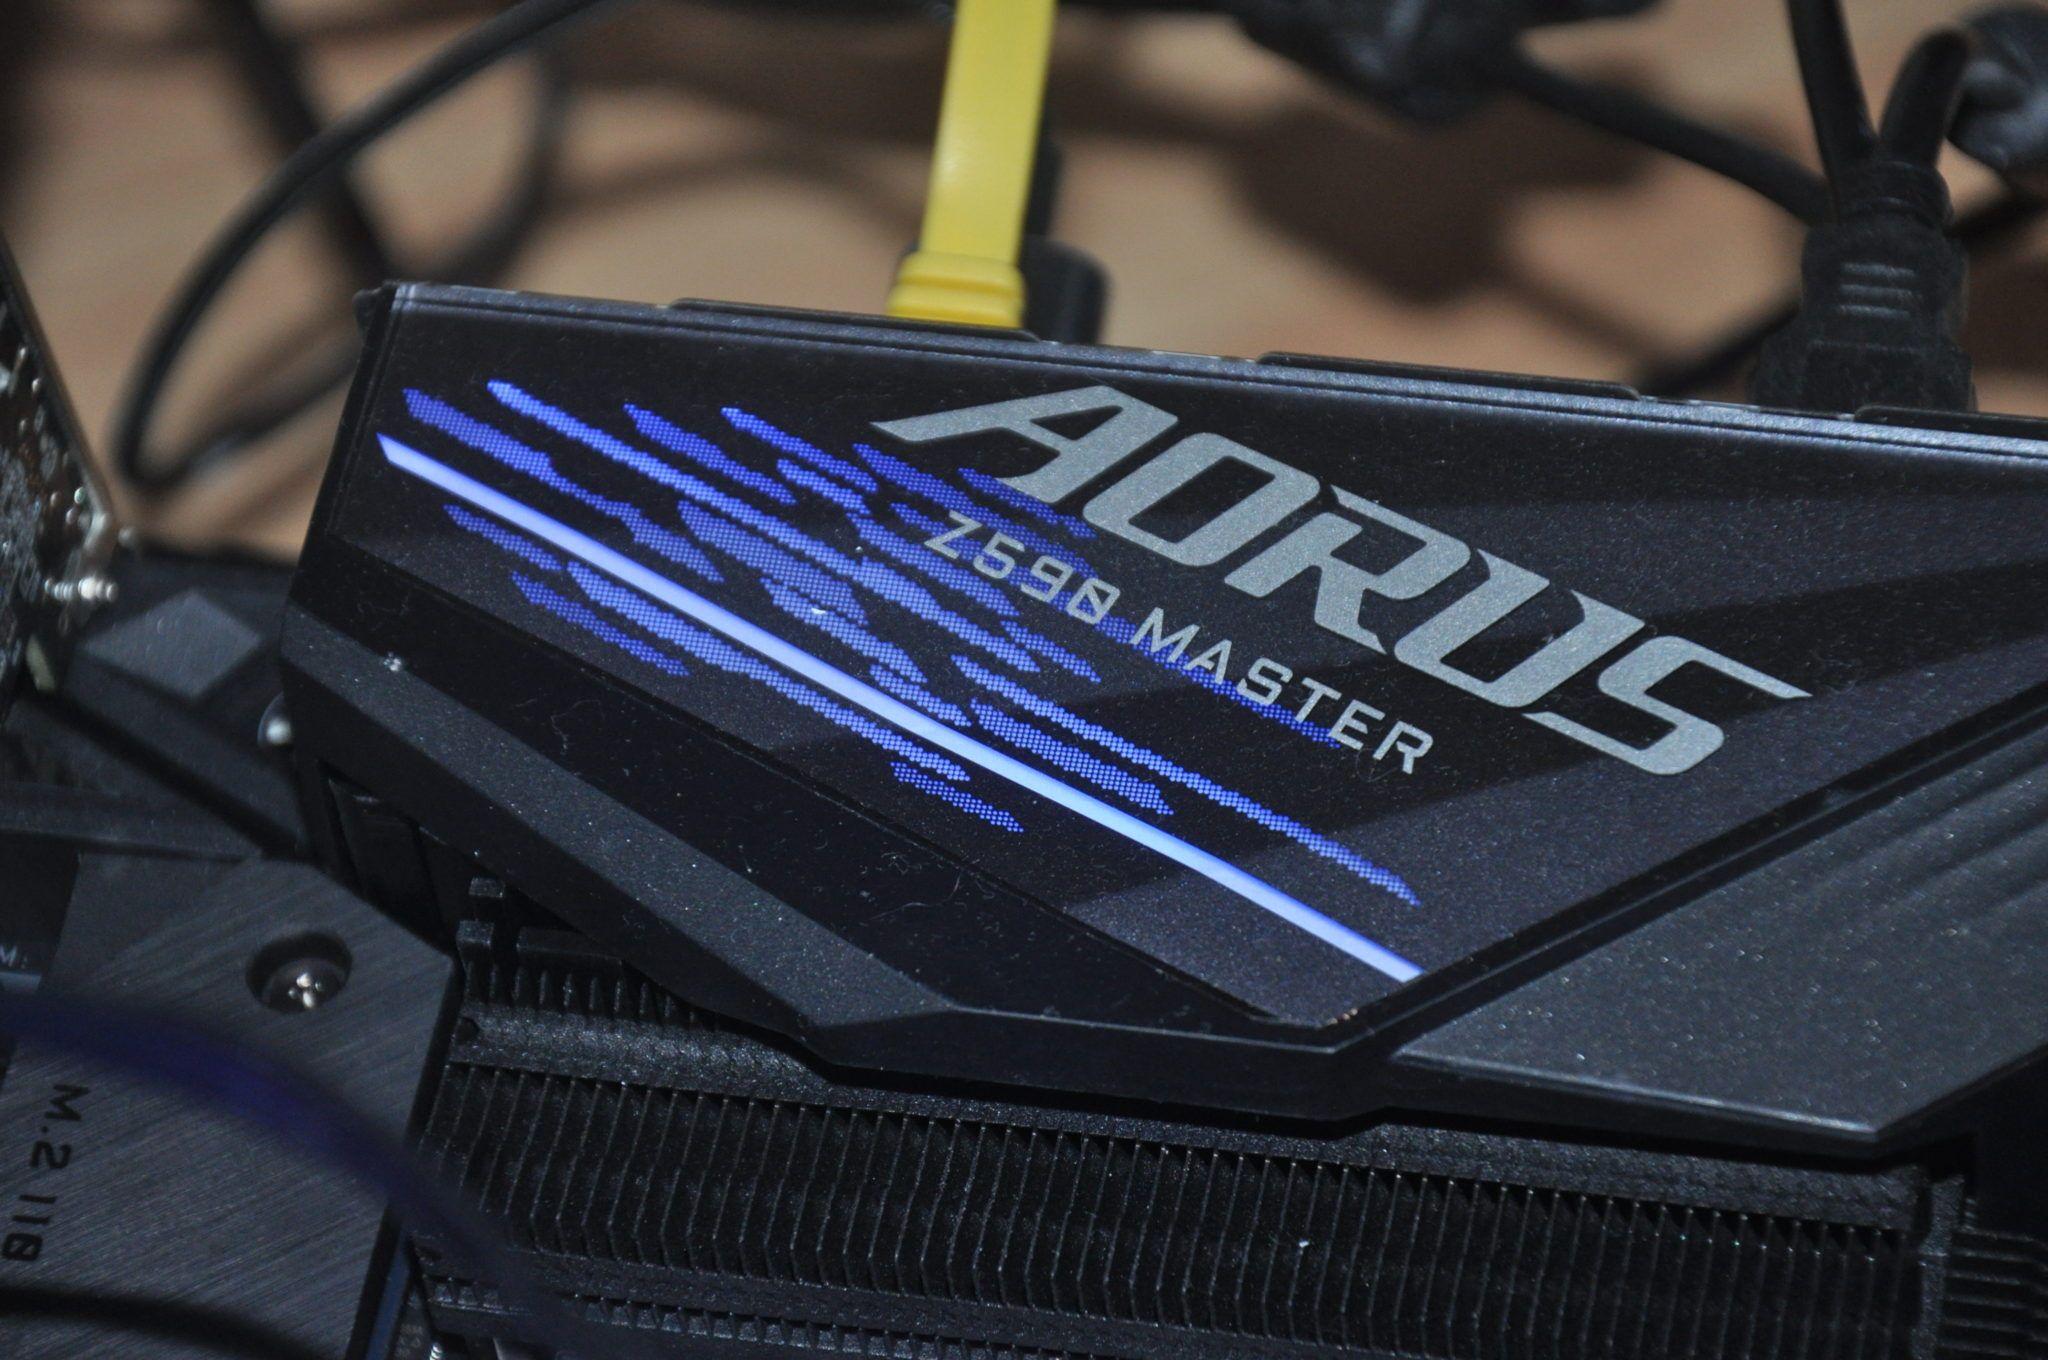 Review Aorus Z590 Master 24